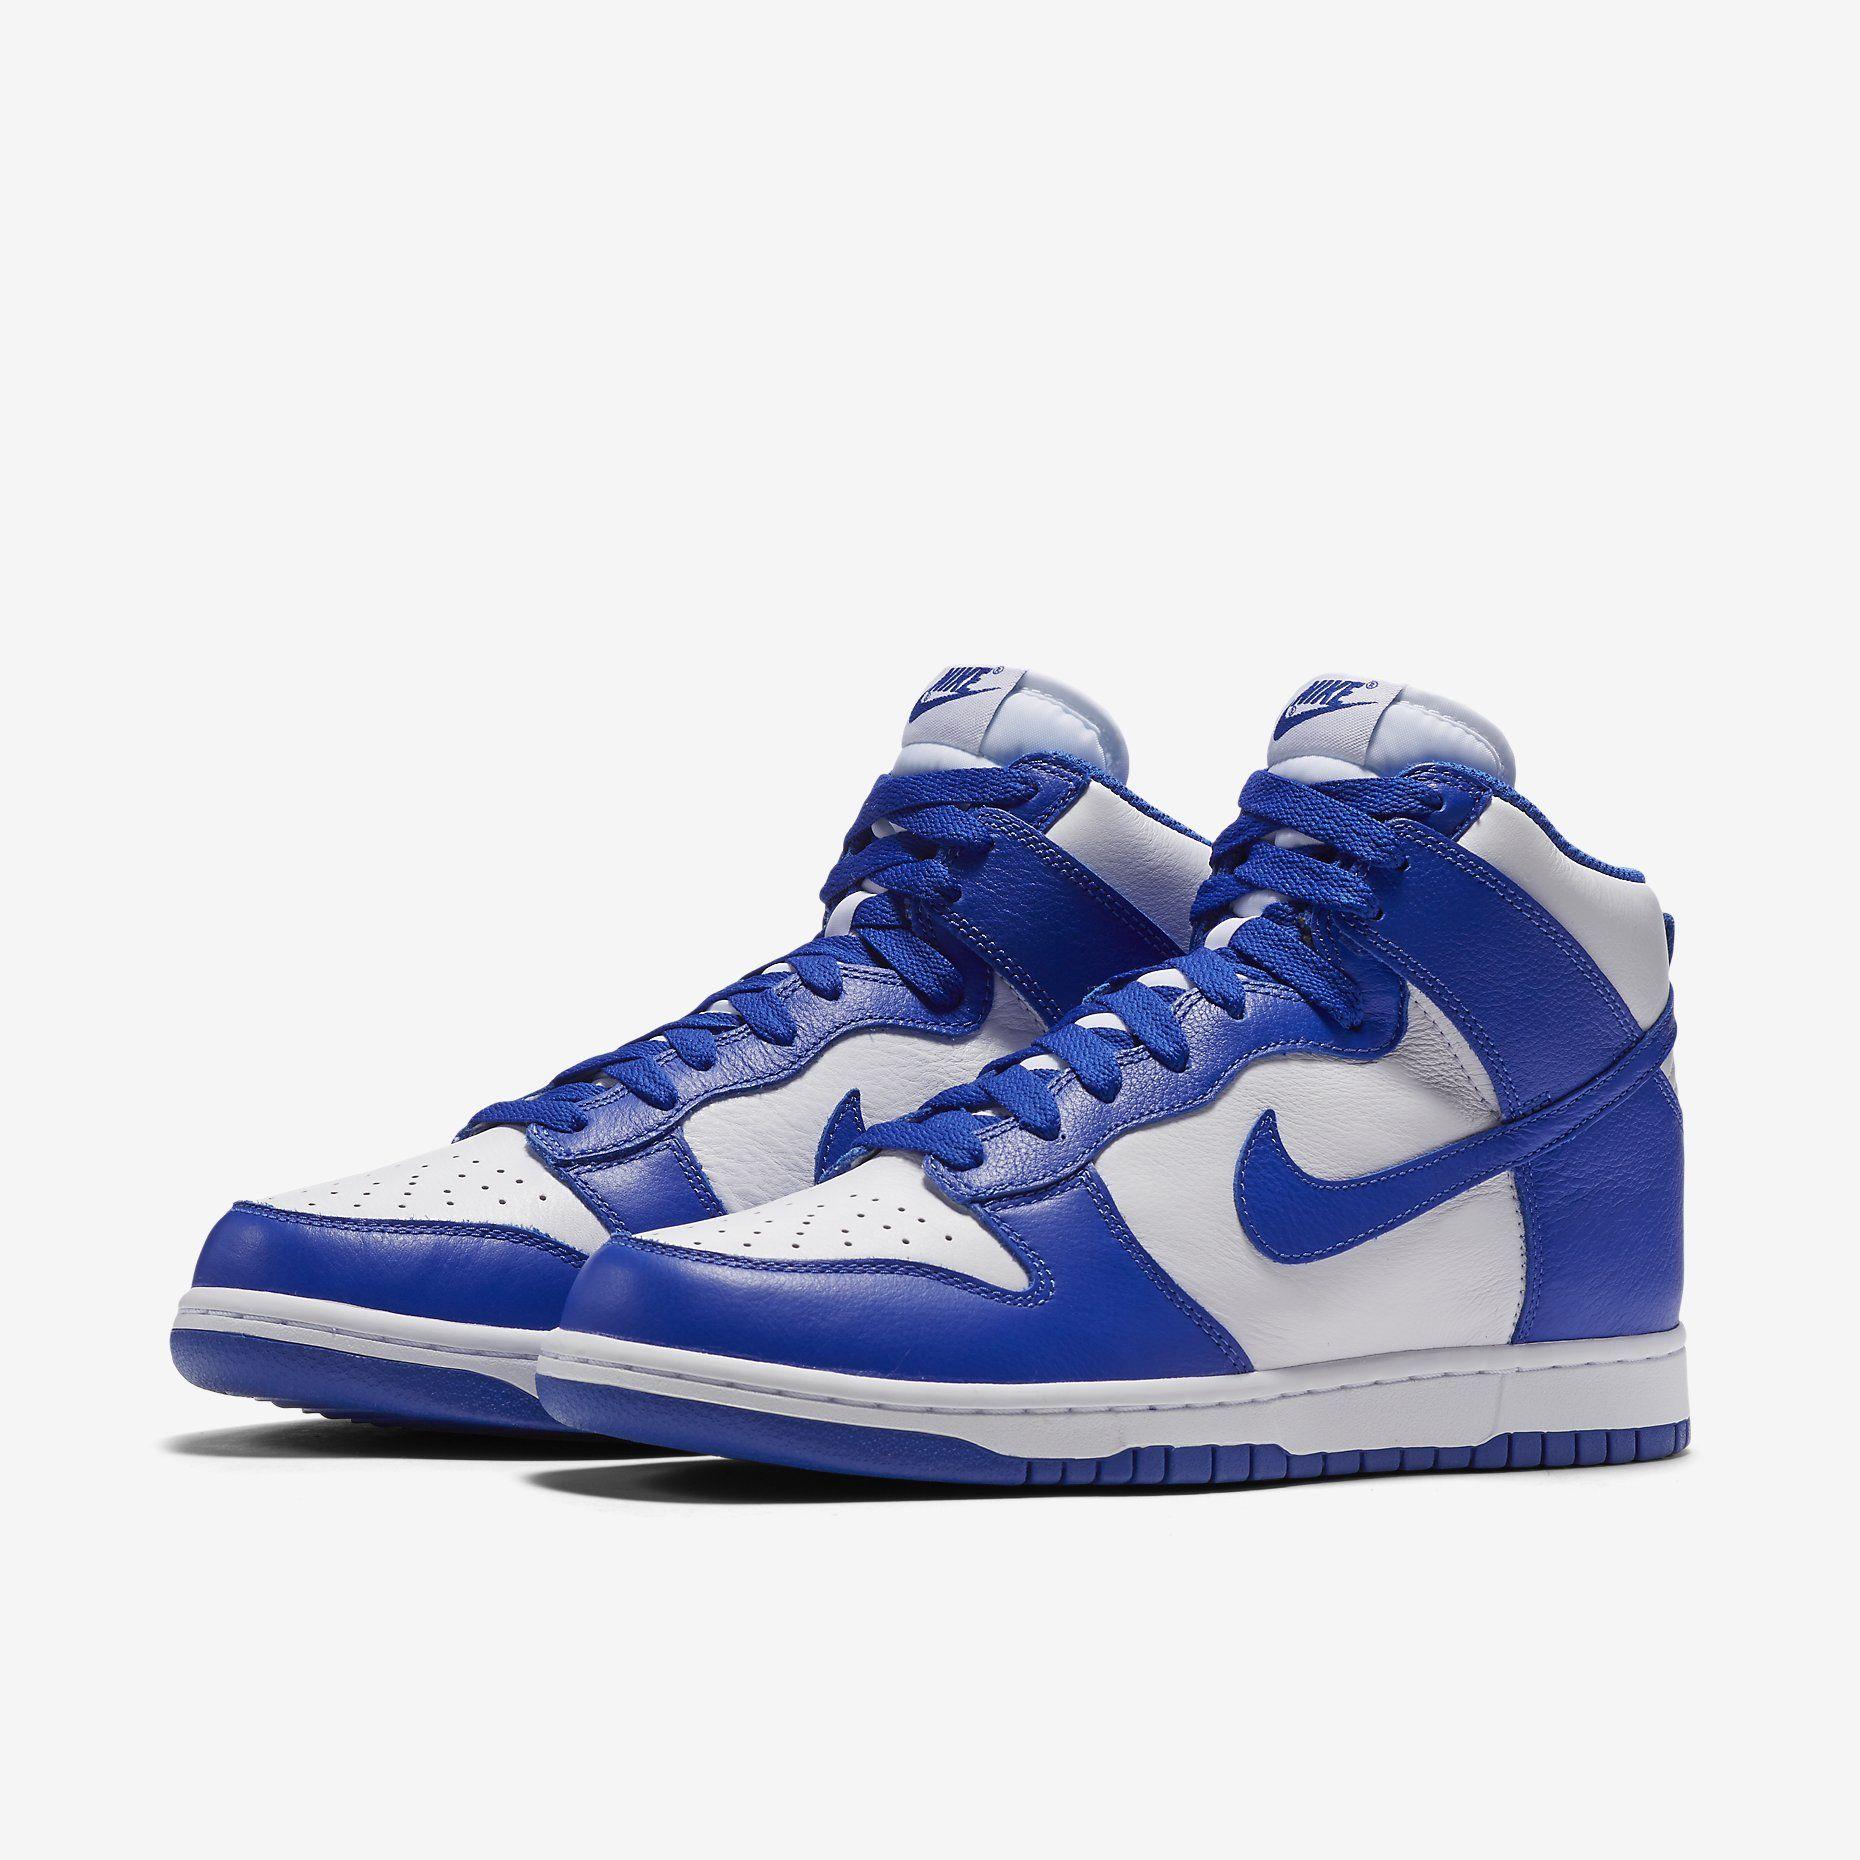 Nike Dunk Retro Qs Nike Dunks Sneakers Nike Air Jordans